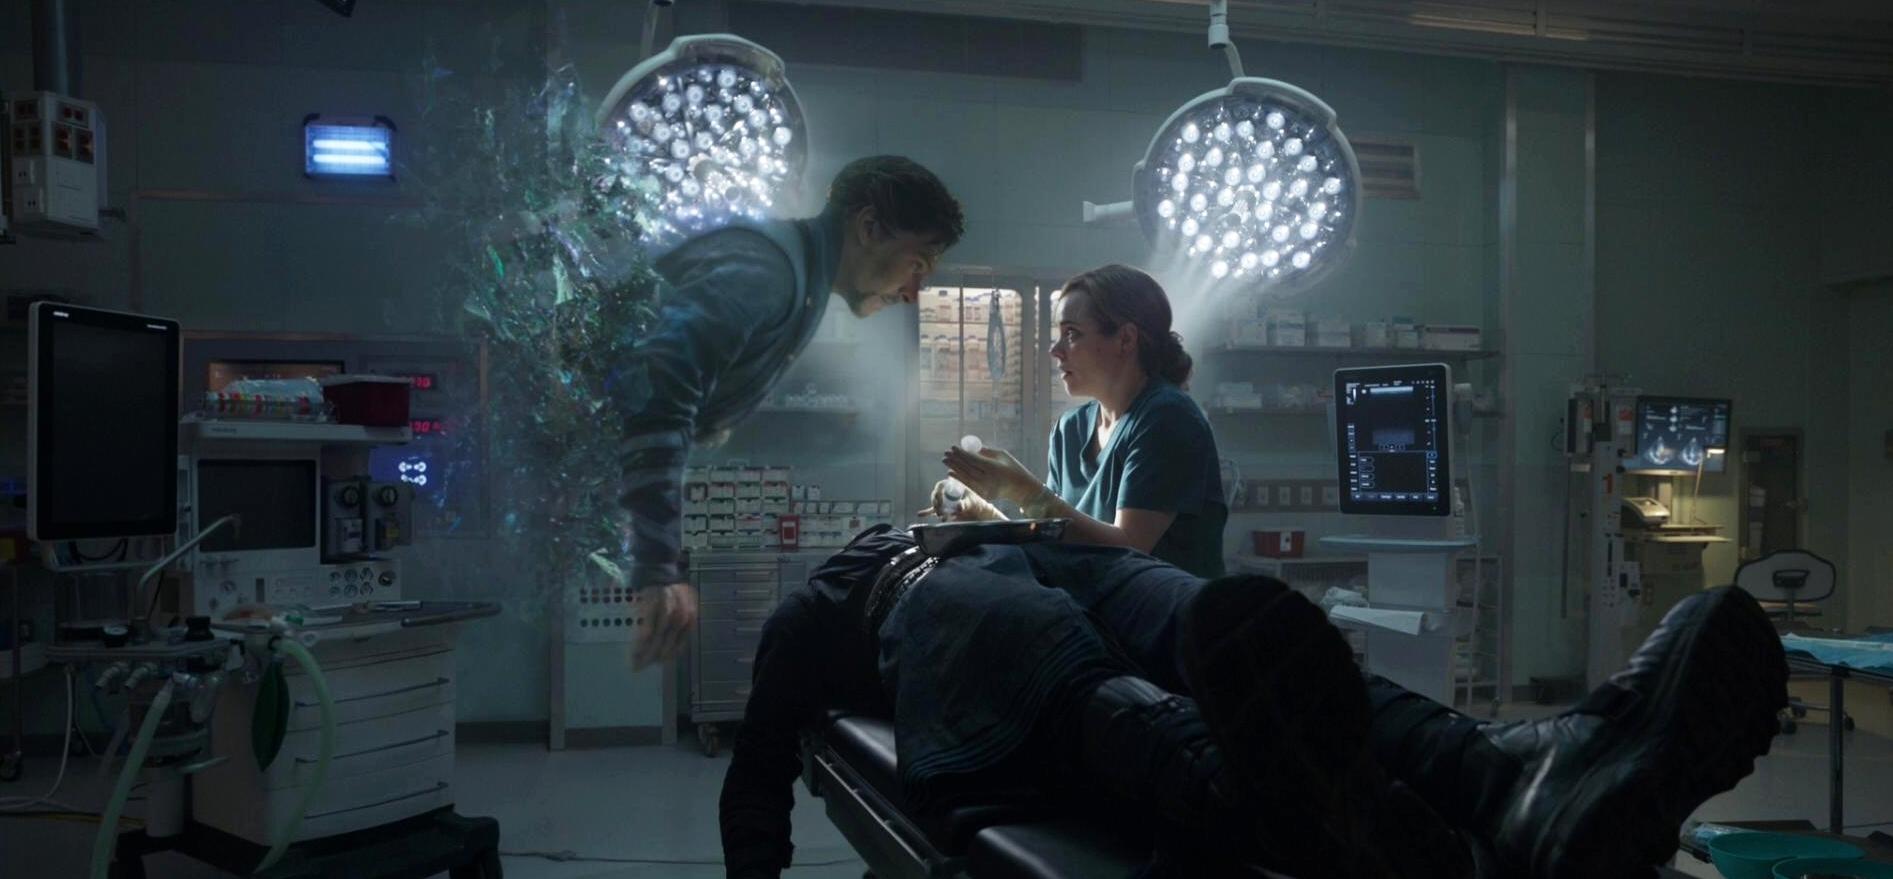 Dr. Strange   (2016) avec Benedict Comberbahcoijzejnrgfrkjn, Rachel McAdams, Tilda Swinton…